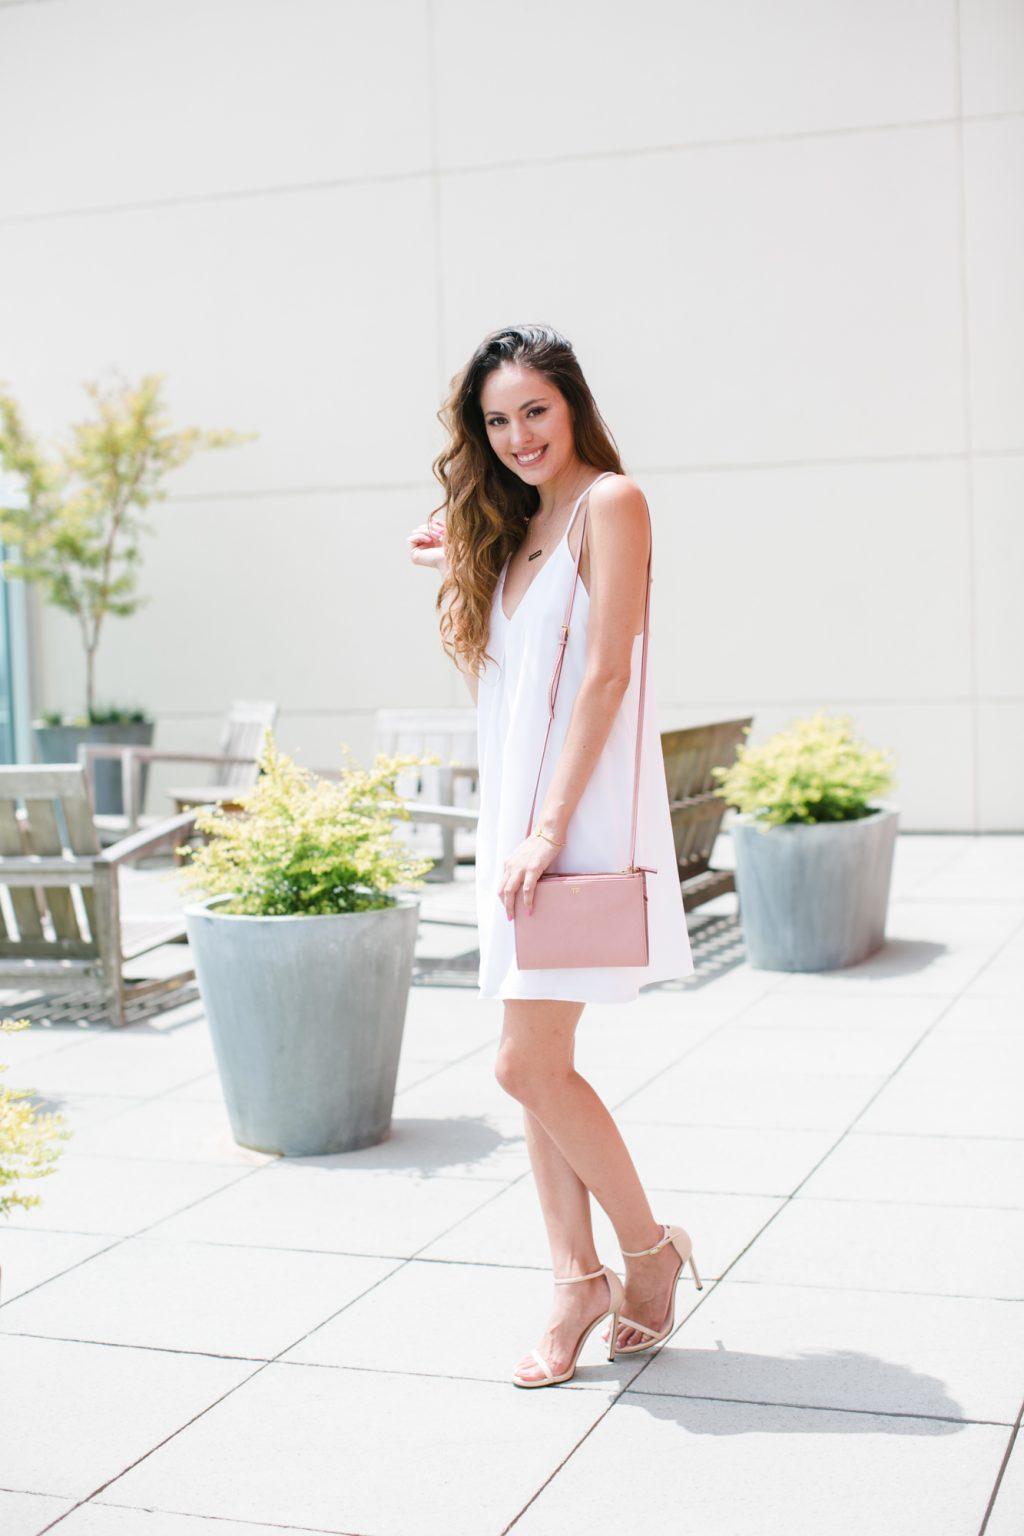 less is more, alice + olivia fierra y back dress, little white dress, stuart weitzman nudist, tom ford pink crossbody, simple summer style